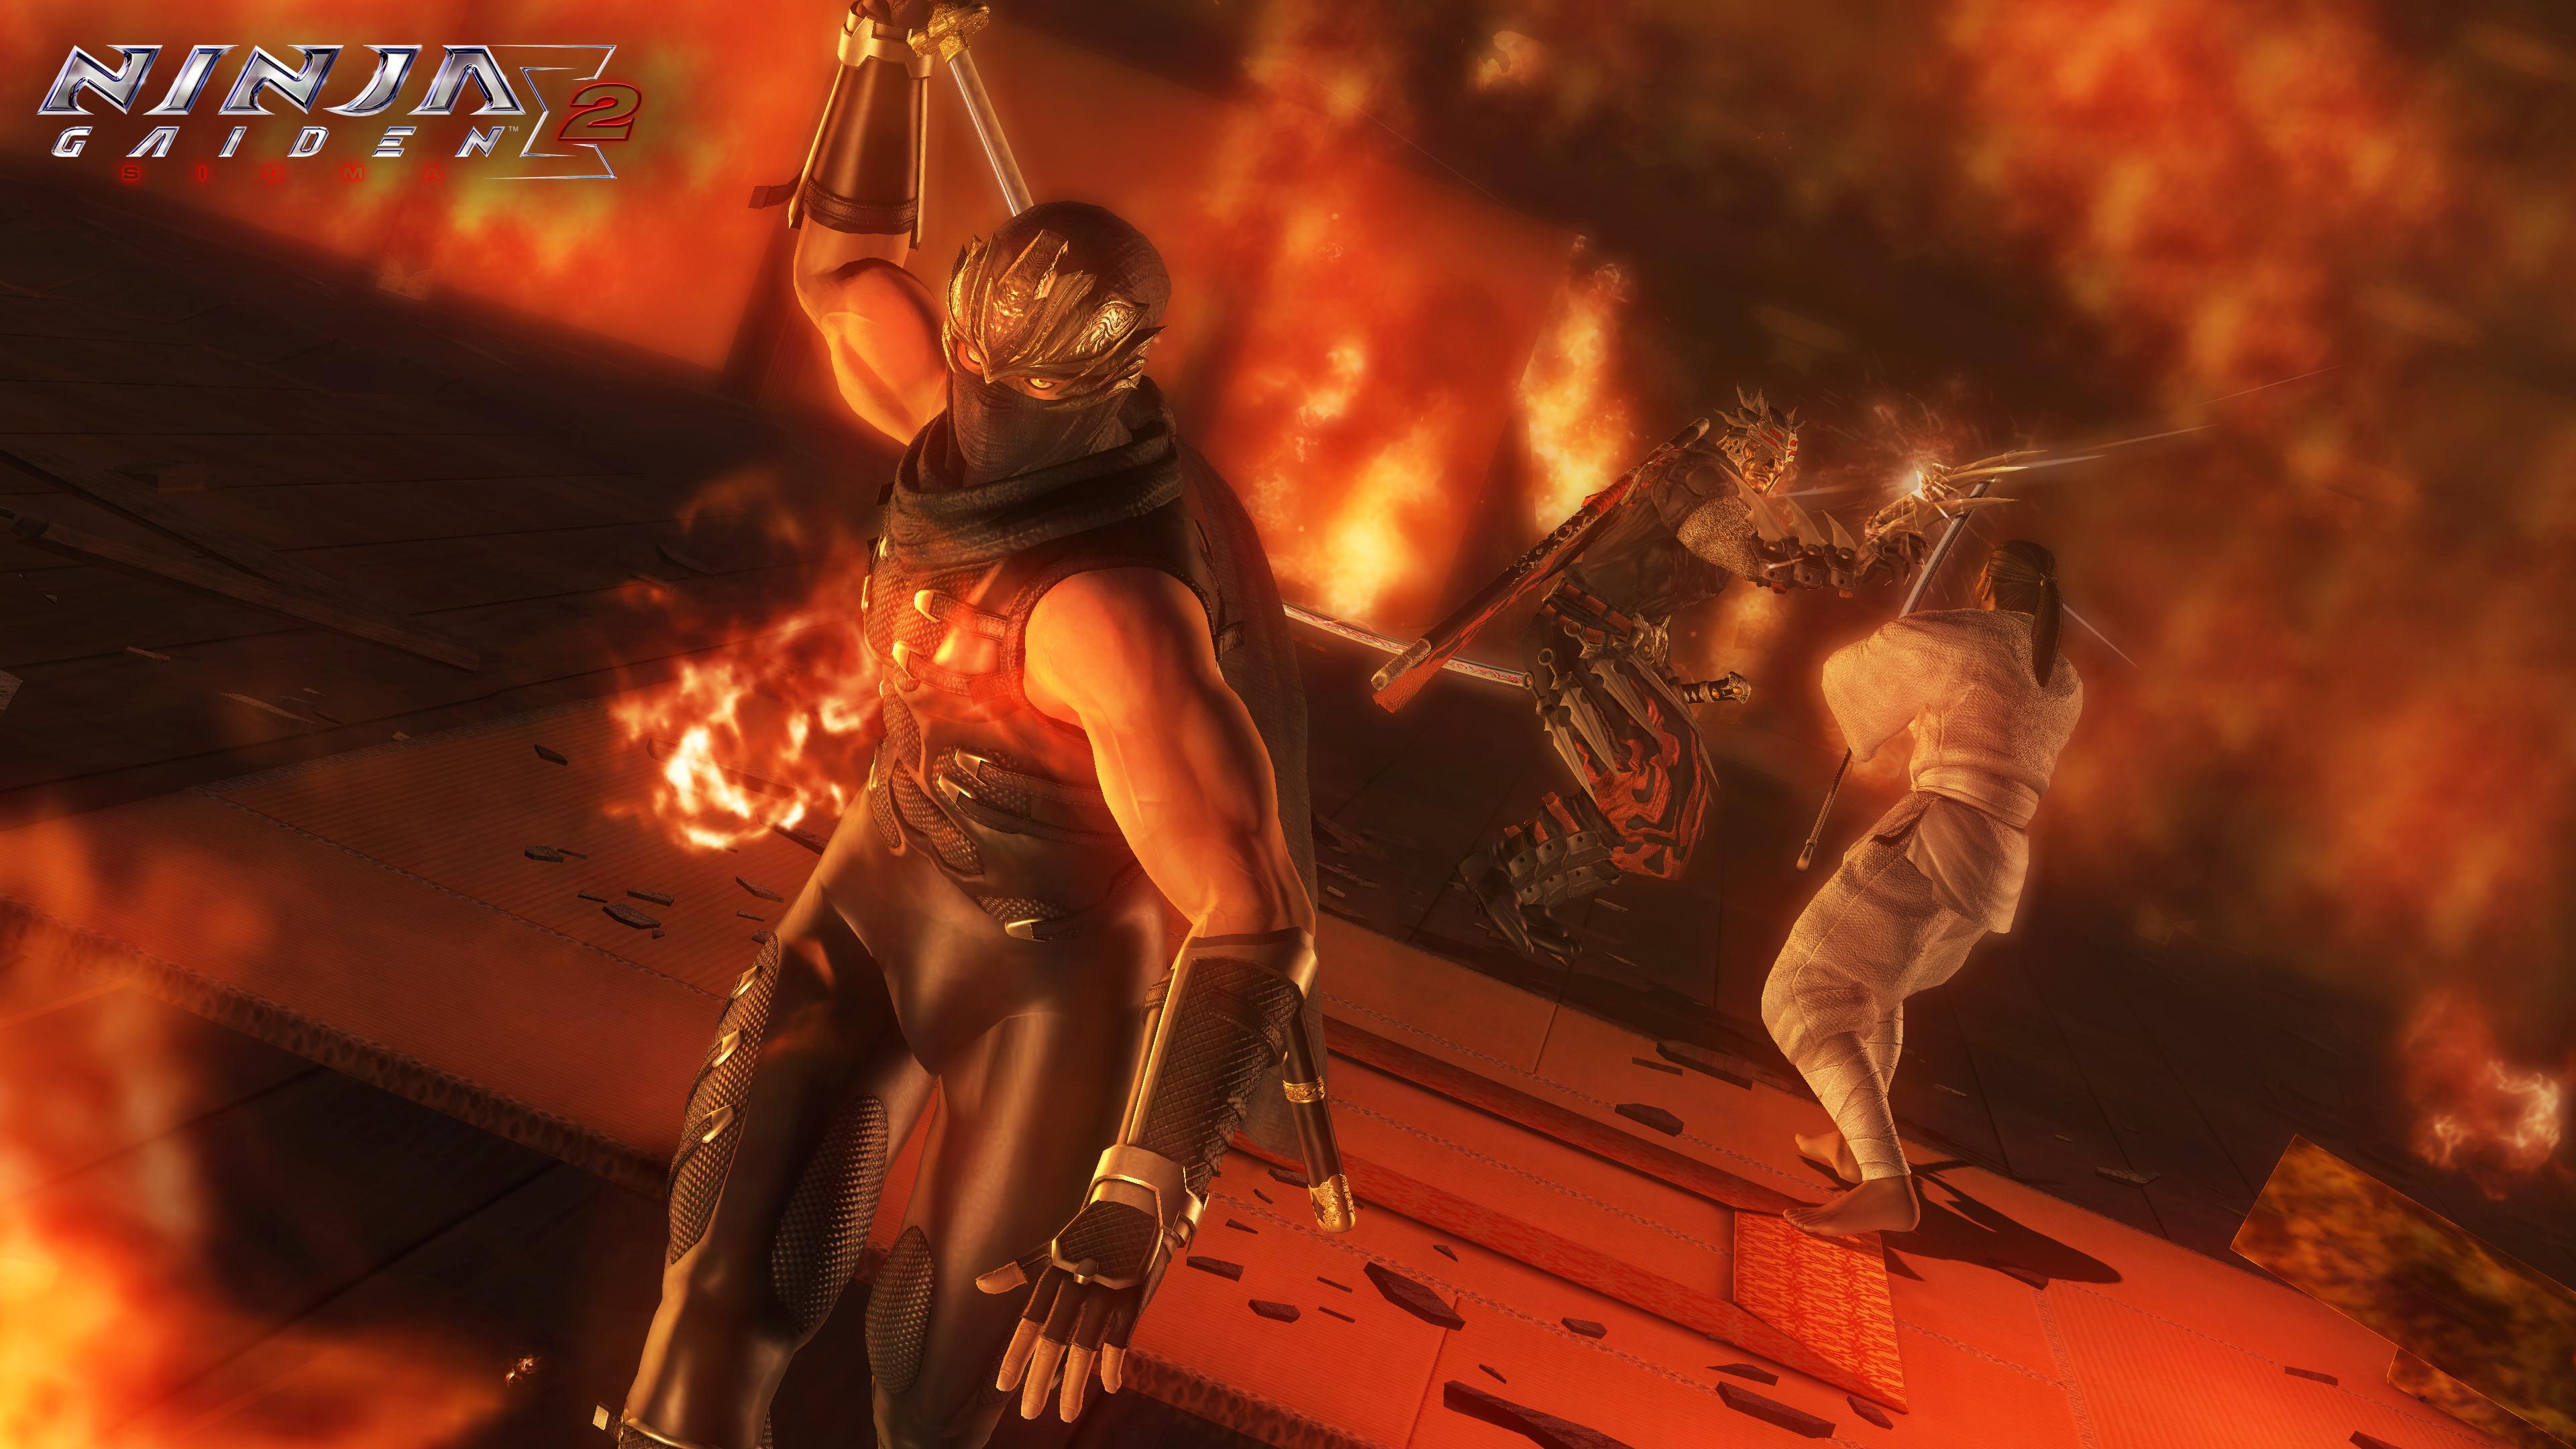 Ninja Gaiden Sigma 2 Screenshot